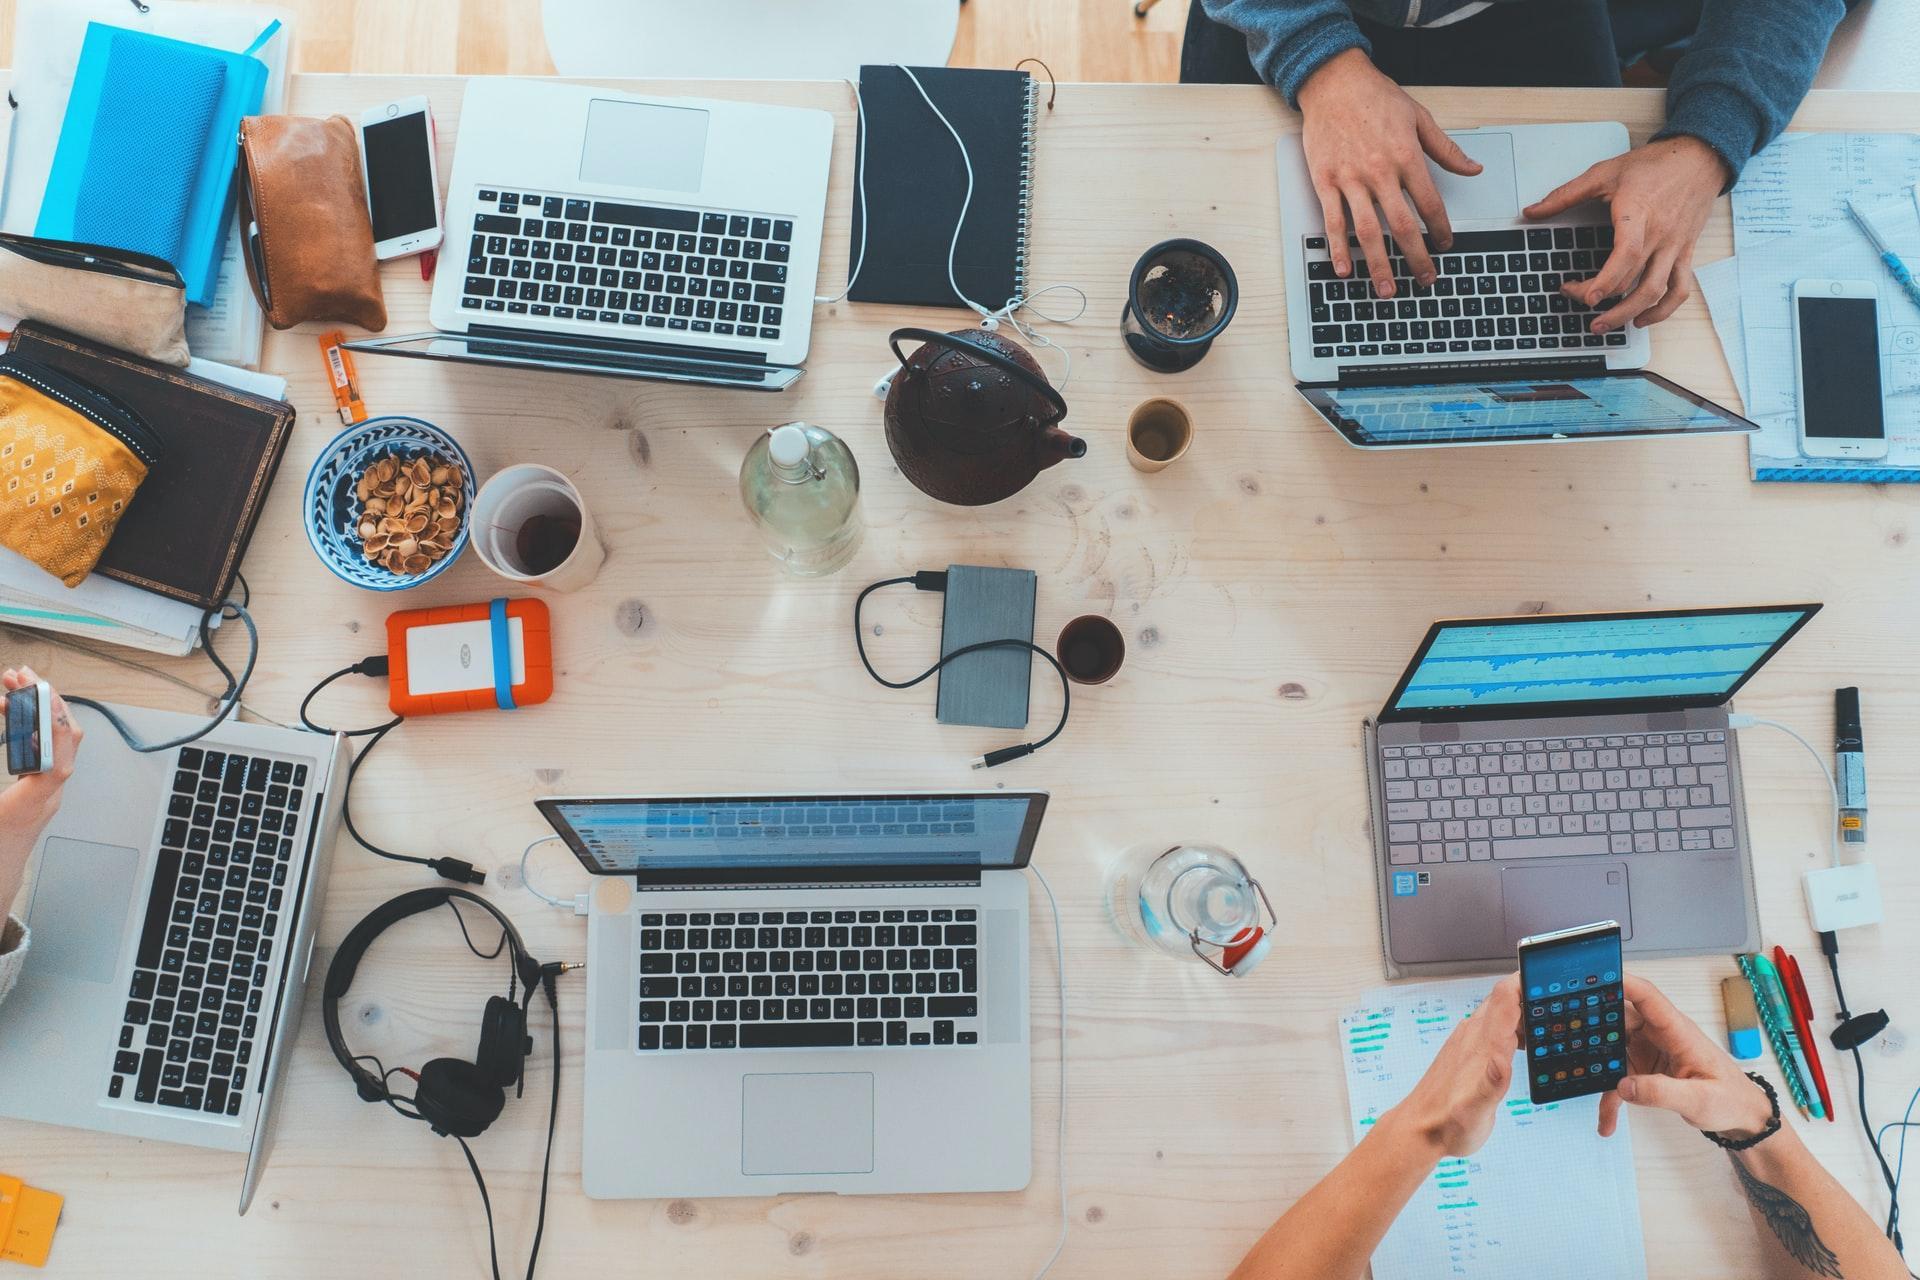 Memulai Usaha di Media Sosial - Shaniba Creative Industry